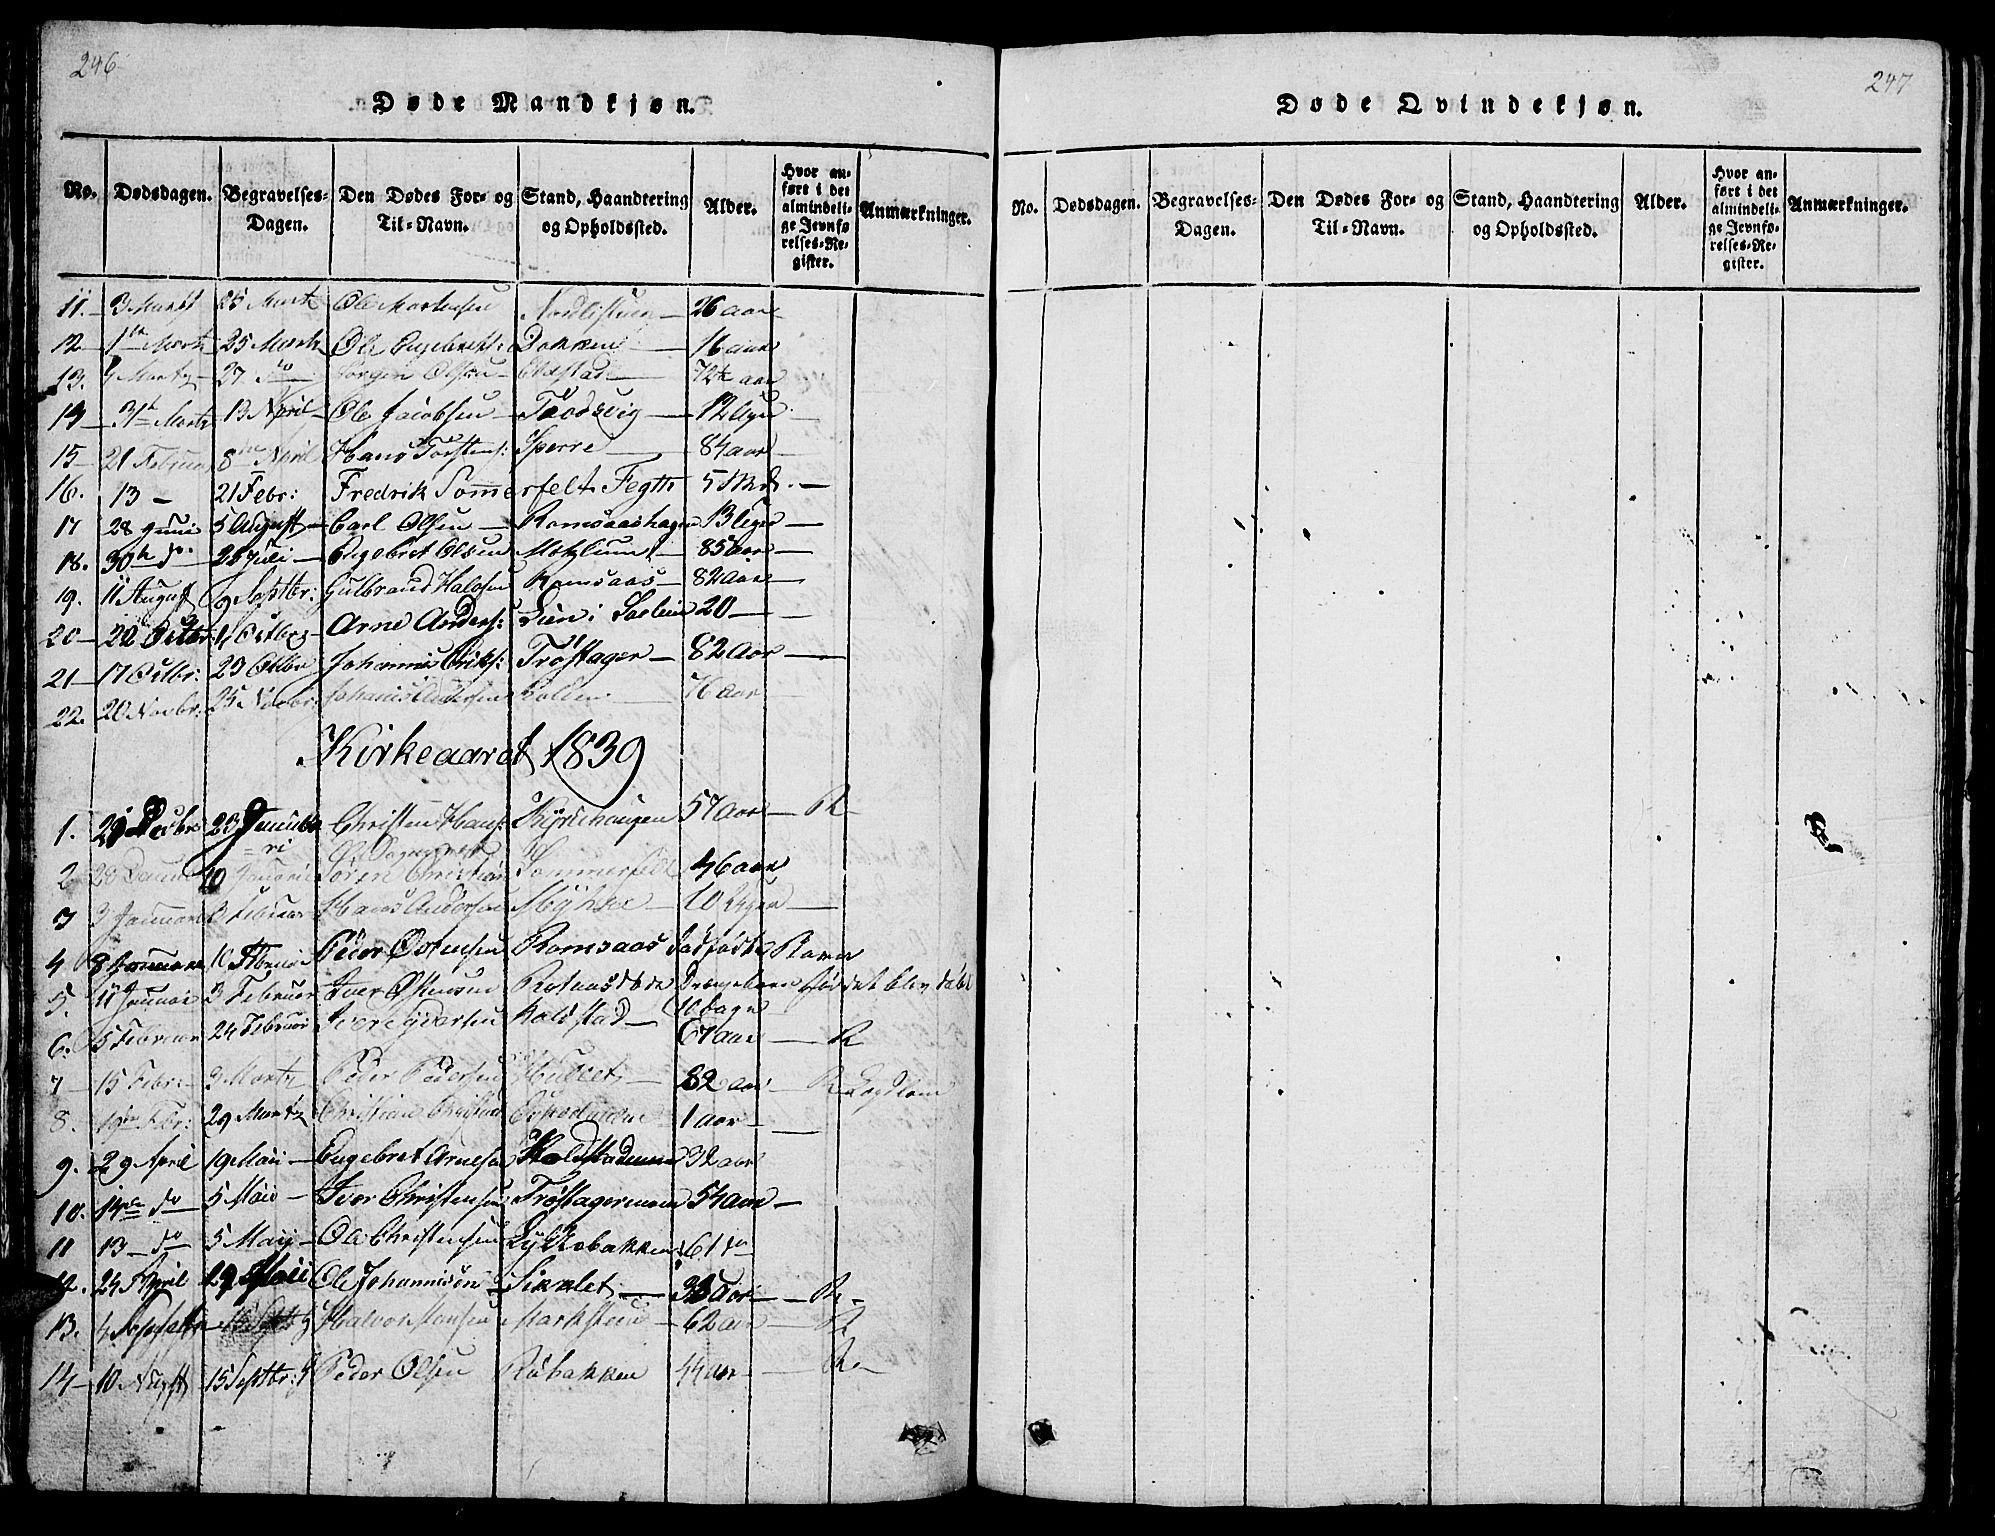 SAH, Ringebu prestekontor, Klokkerbok nr. 1, 1821-1839, s. 246-247